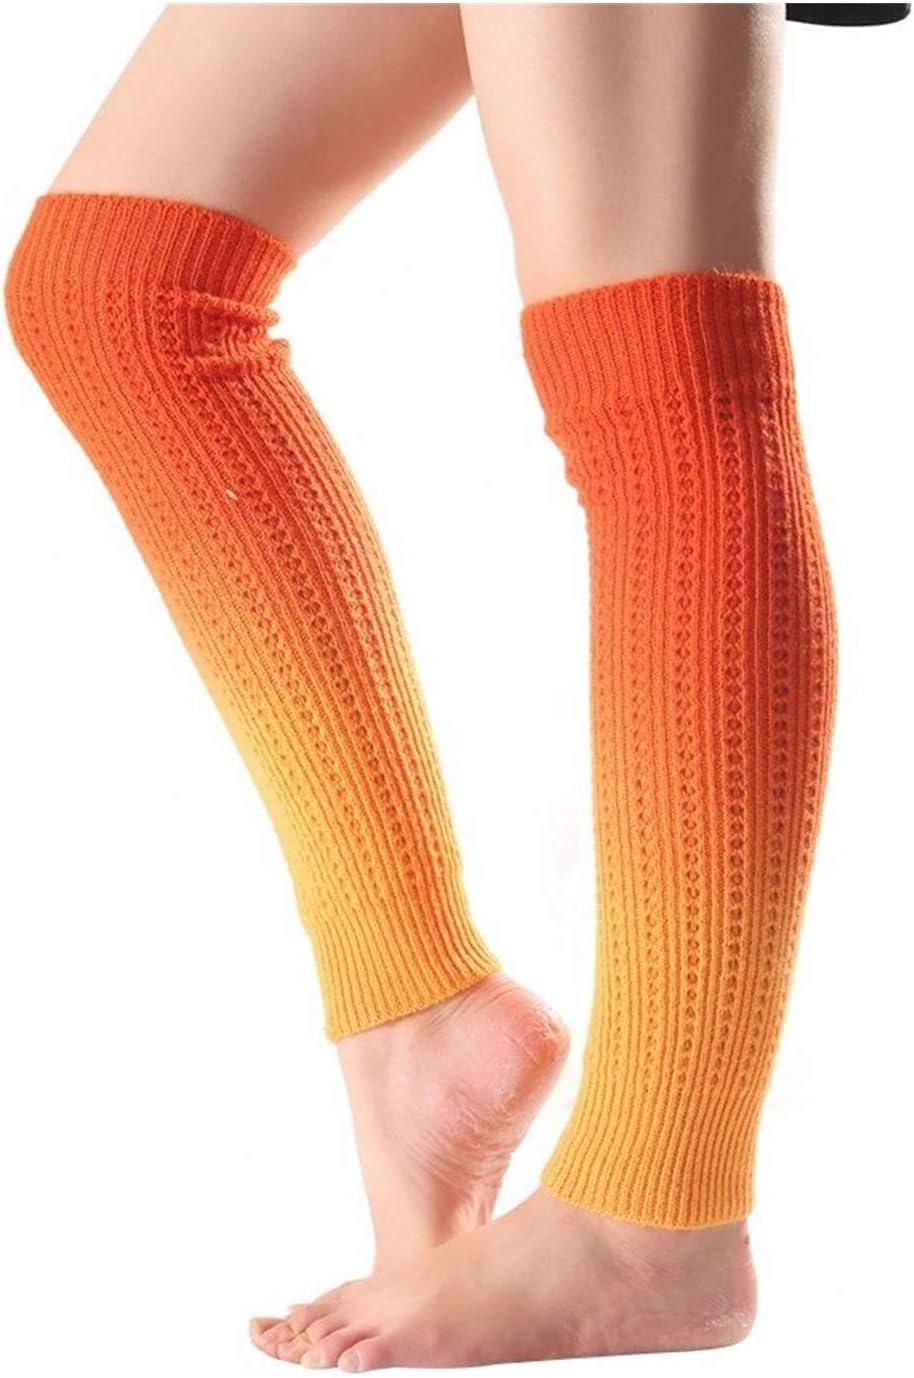 YUNSHAO Leg Warmers for Women & Girls, Gradient Knee High Women Boot Socks Winter Knitted Footless Leg Sleeve Warmer Socks Leg Warmer (Color : Orange, Size : 53cm x 10cm)